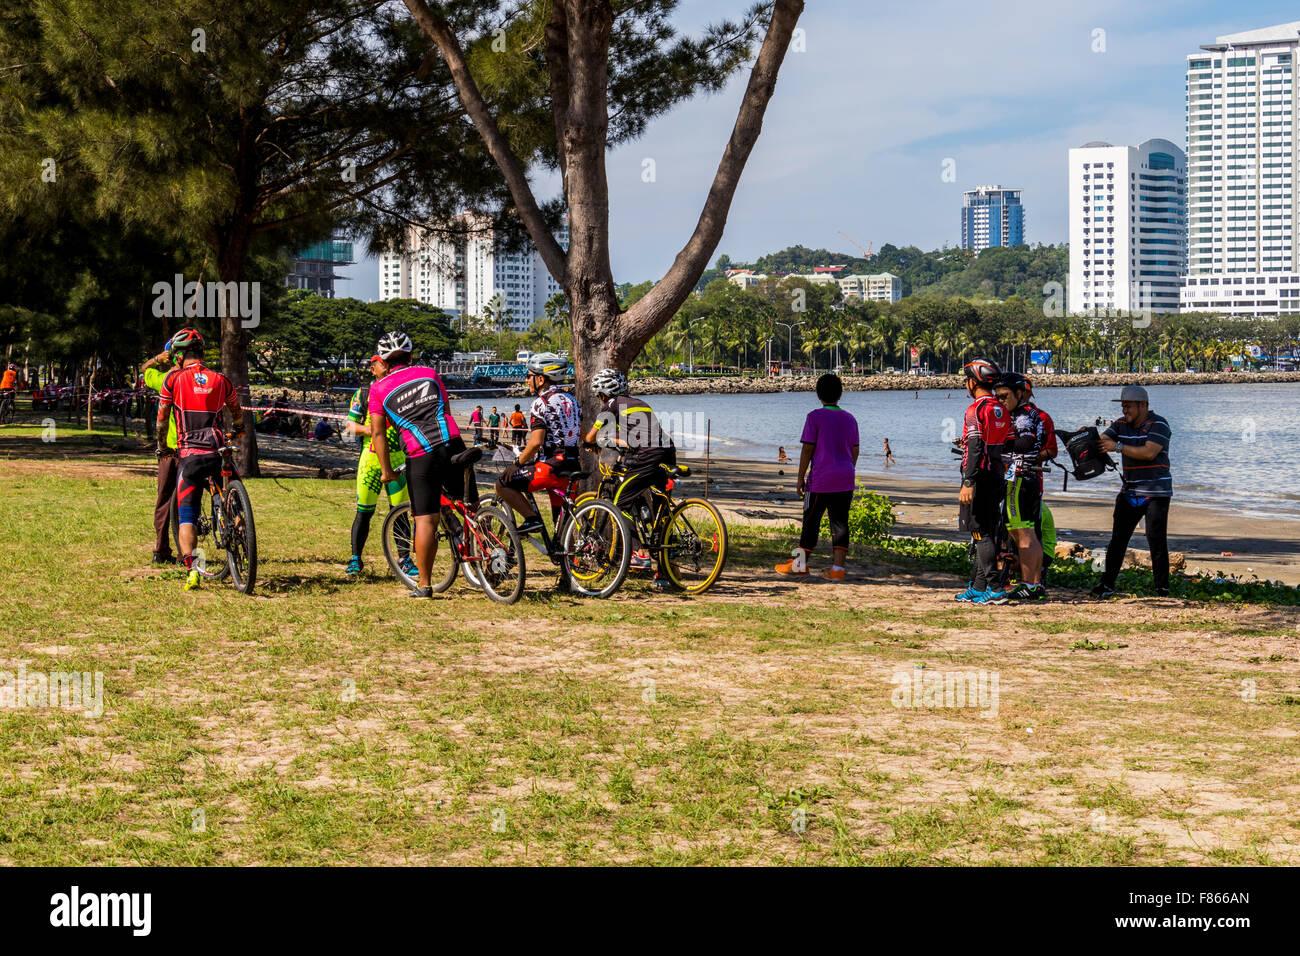 Cyclist enjoying day out at Likas Bay in Kota Kinabalu Sabah East Malaysia on Island of Borneo - Stock Image